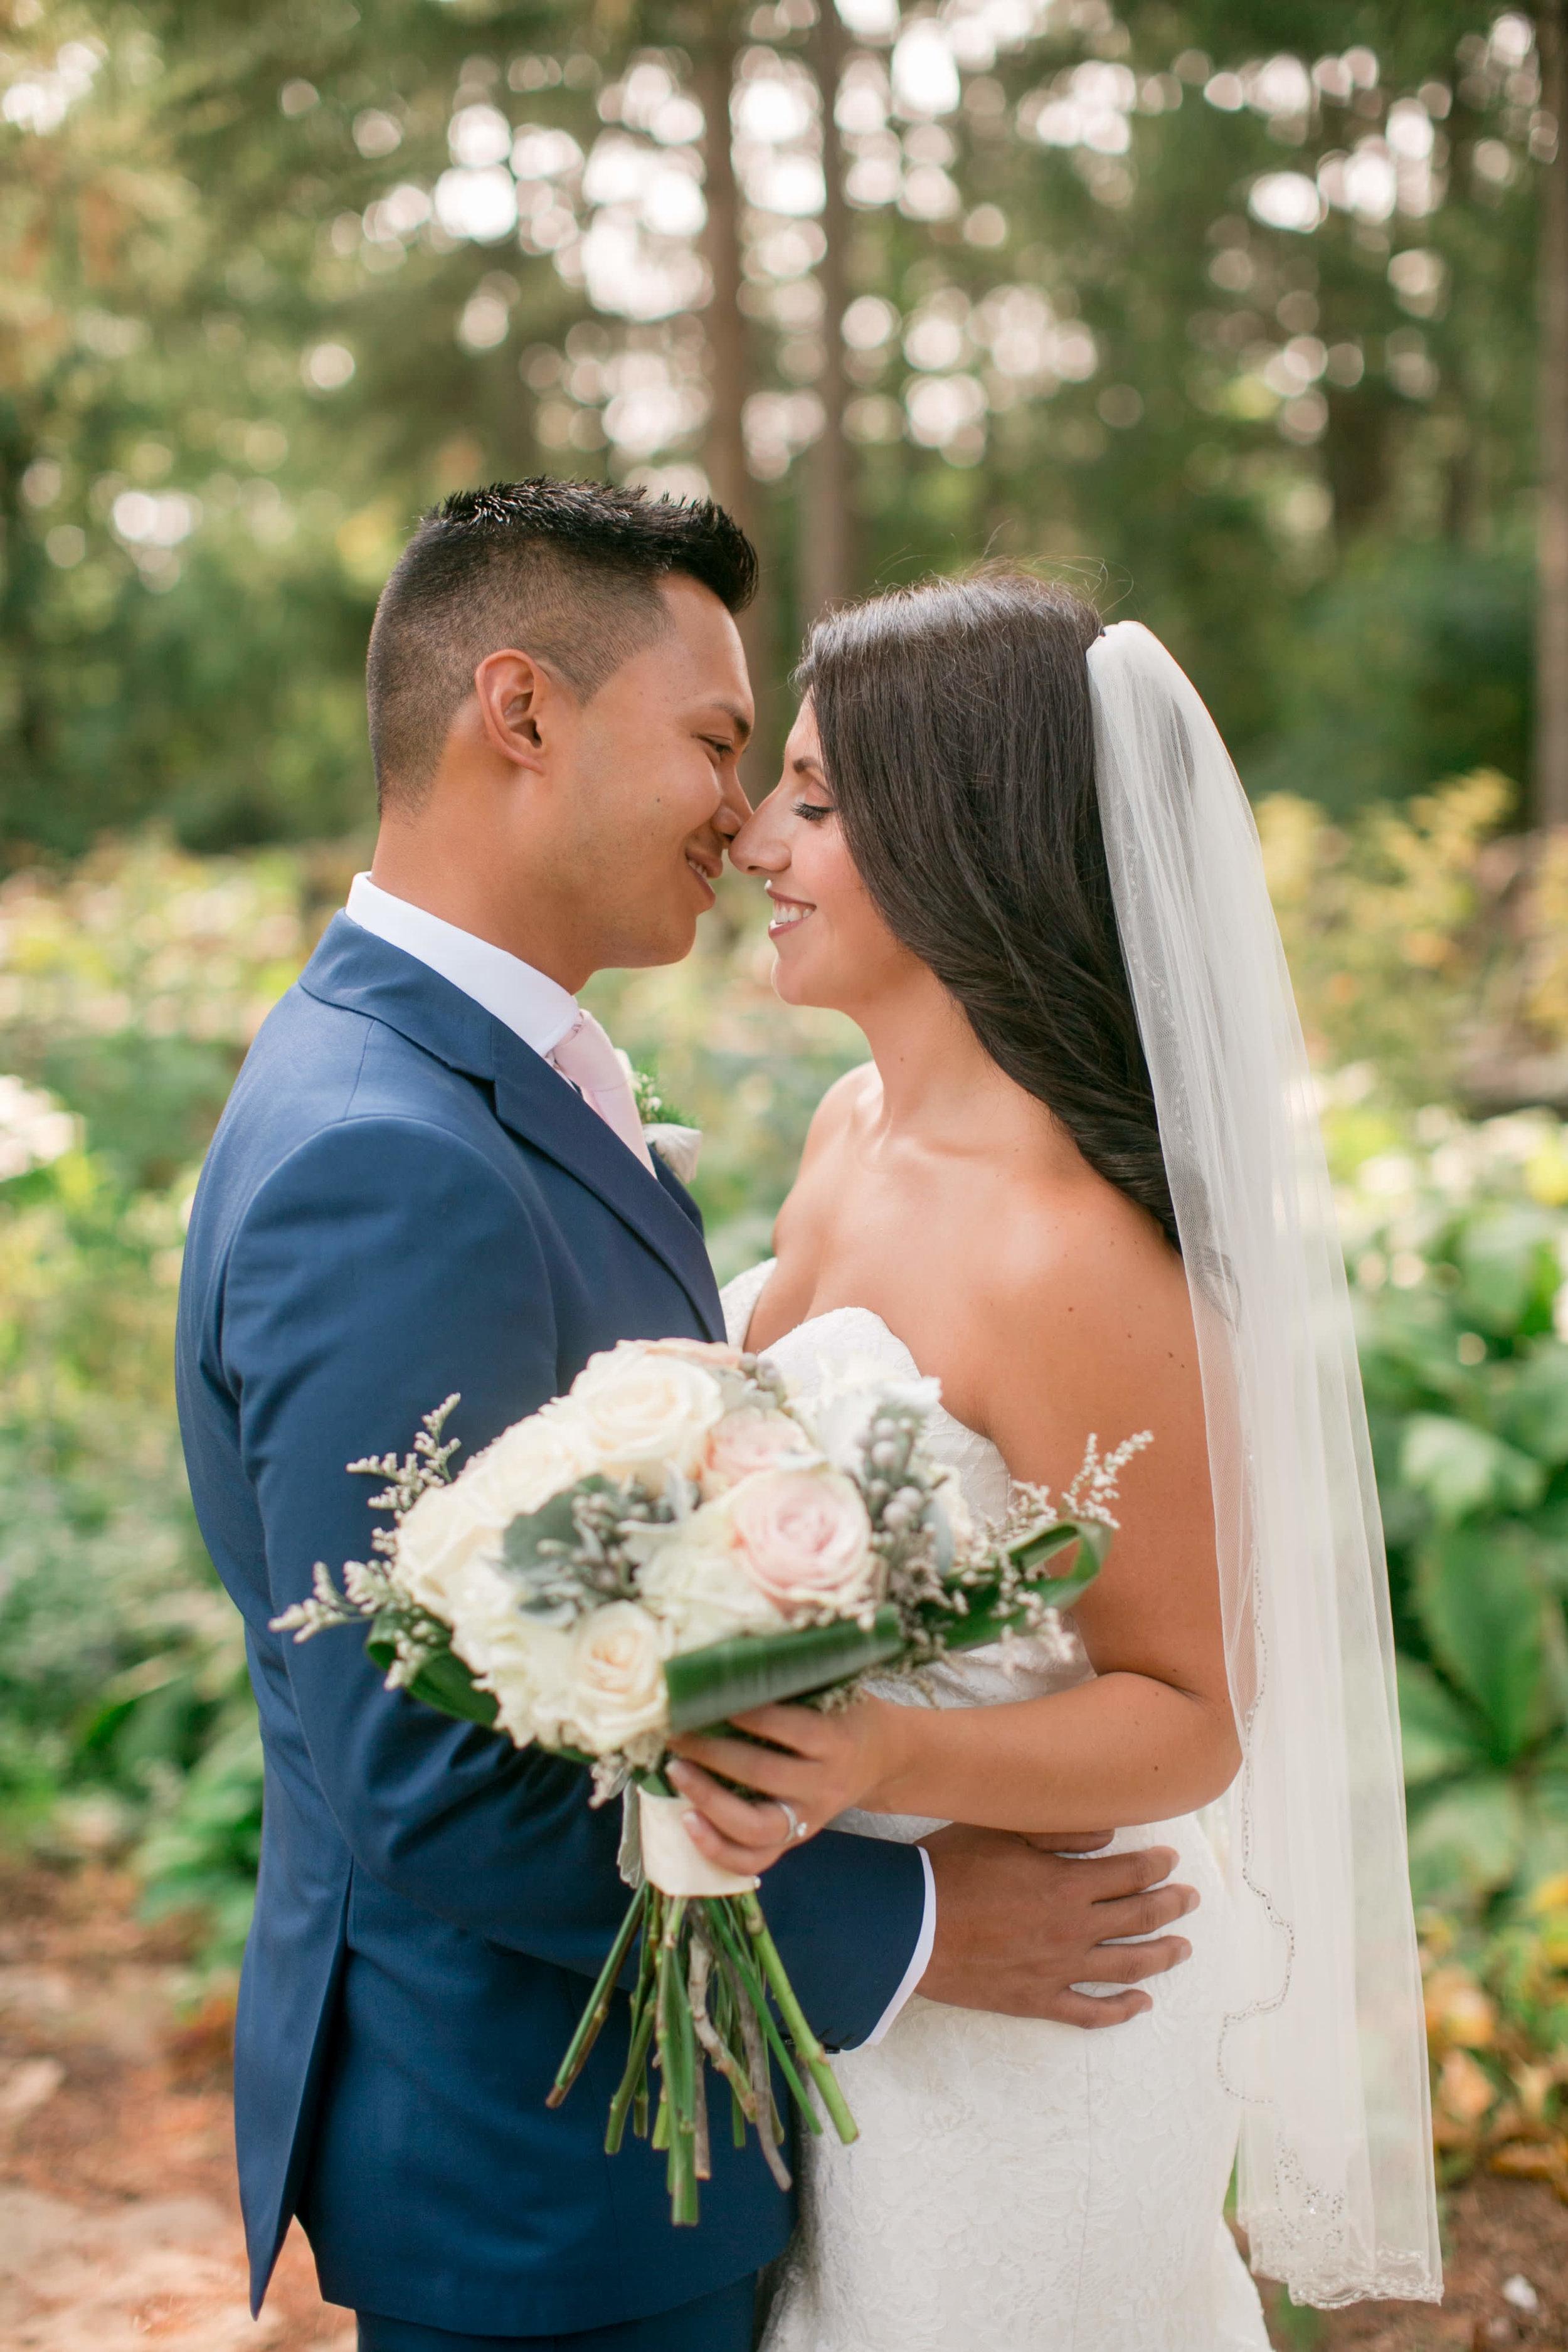 Stefanie___Bernard___Daniel_Ricci_Weddings_High_Res._Finals__369.jpg